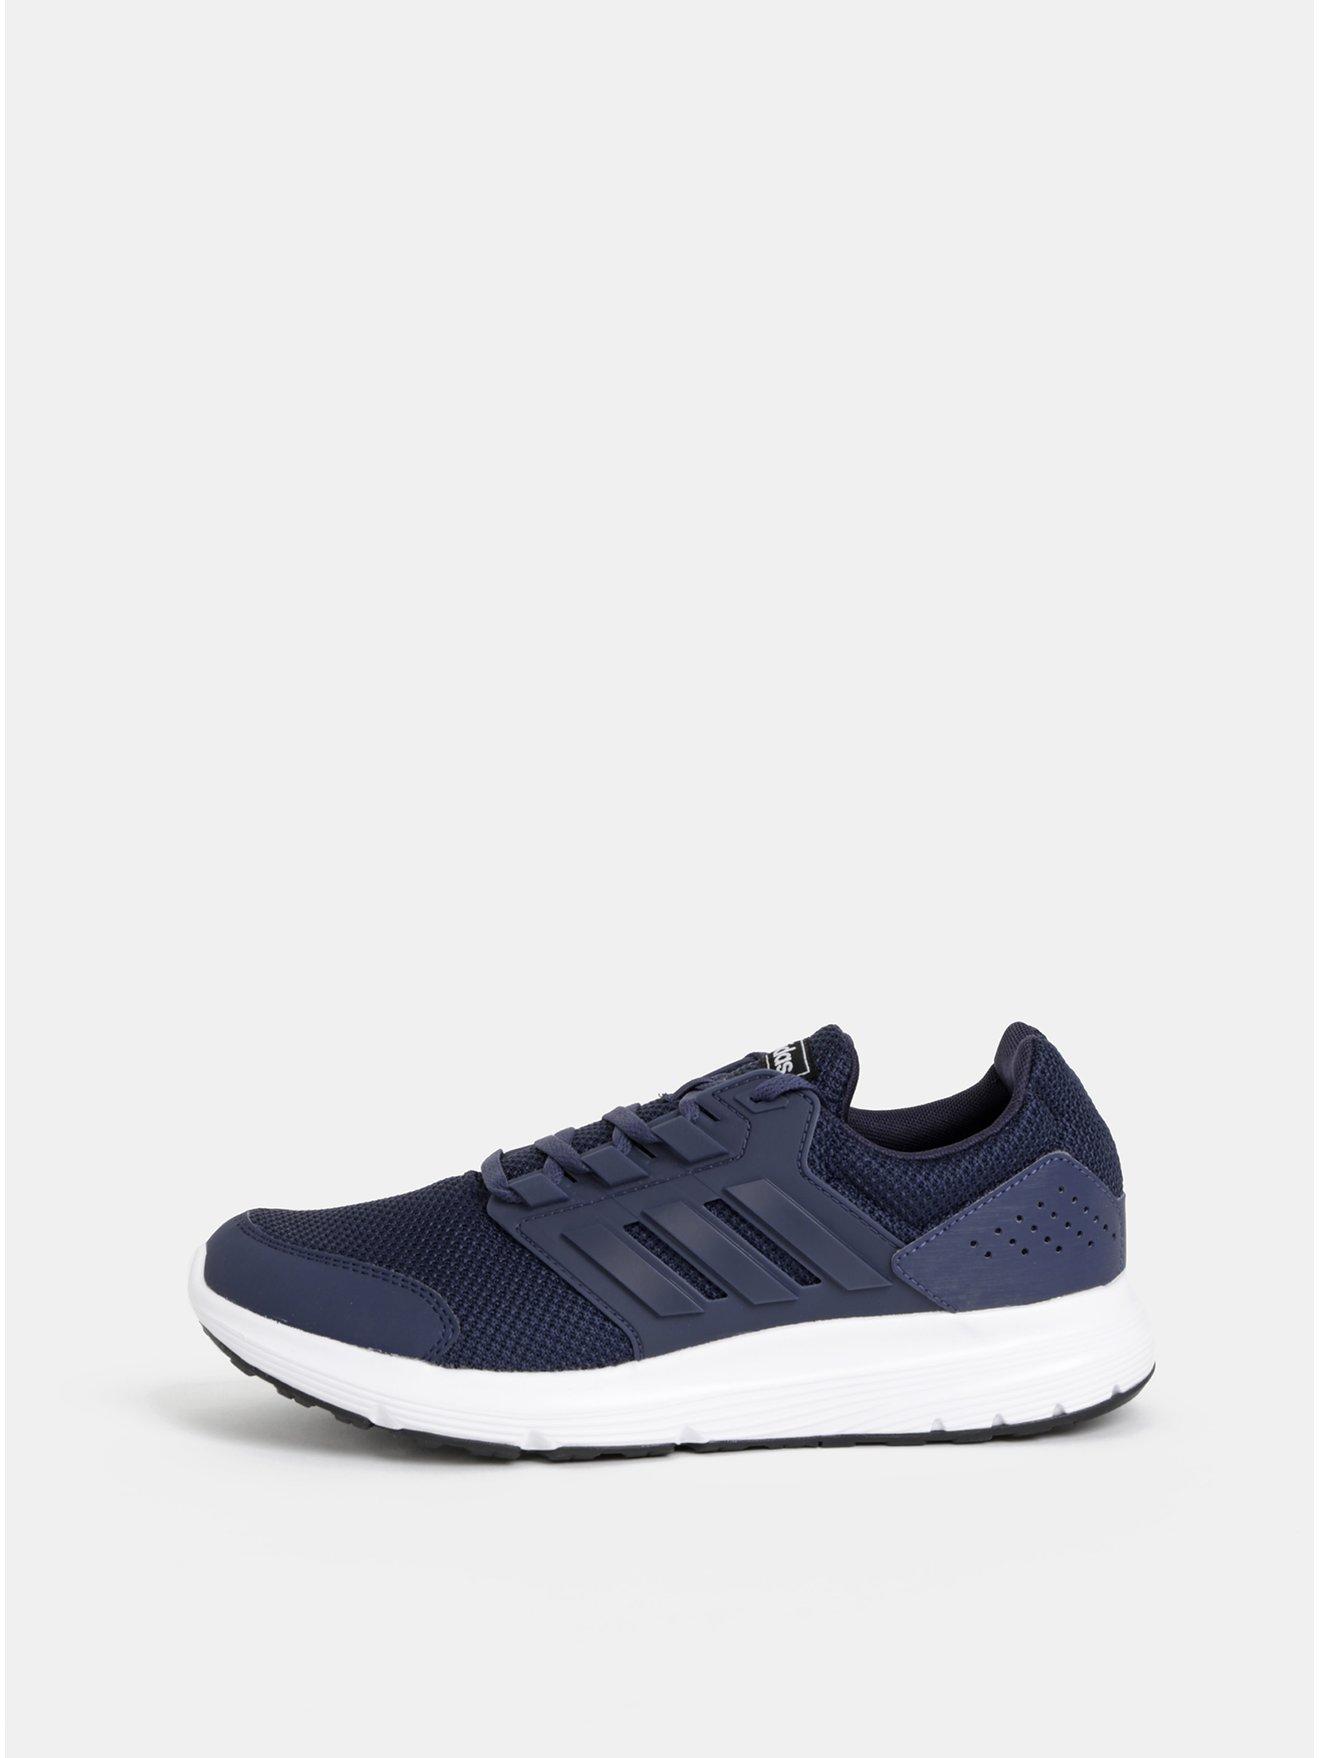 Tmavě modré pánské tenisky adidas CORE Galaxy 4